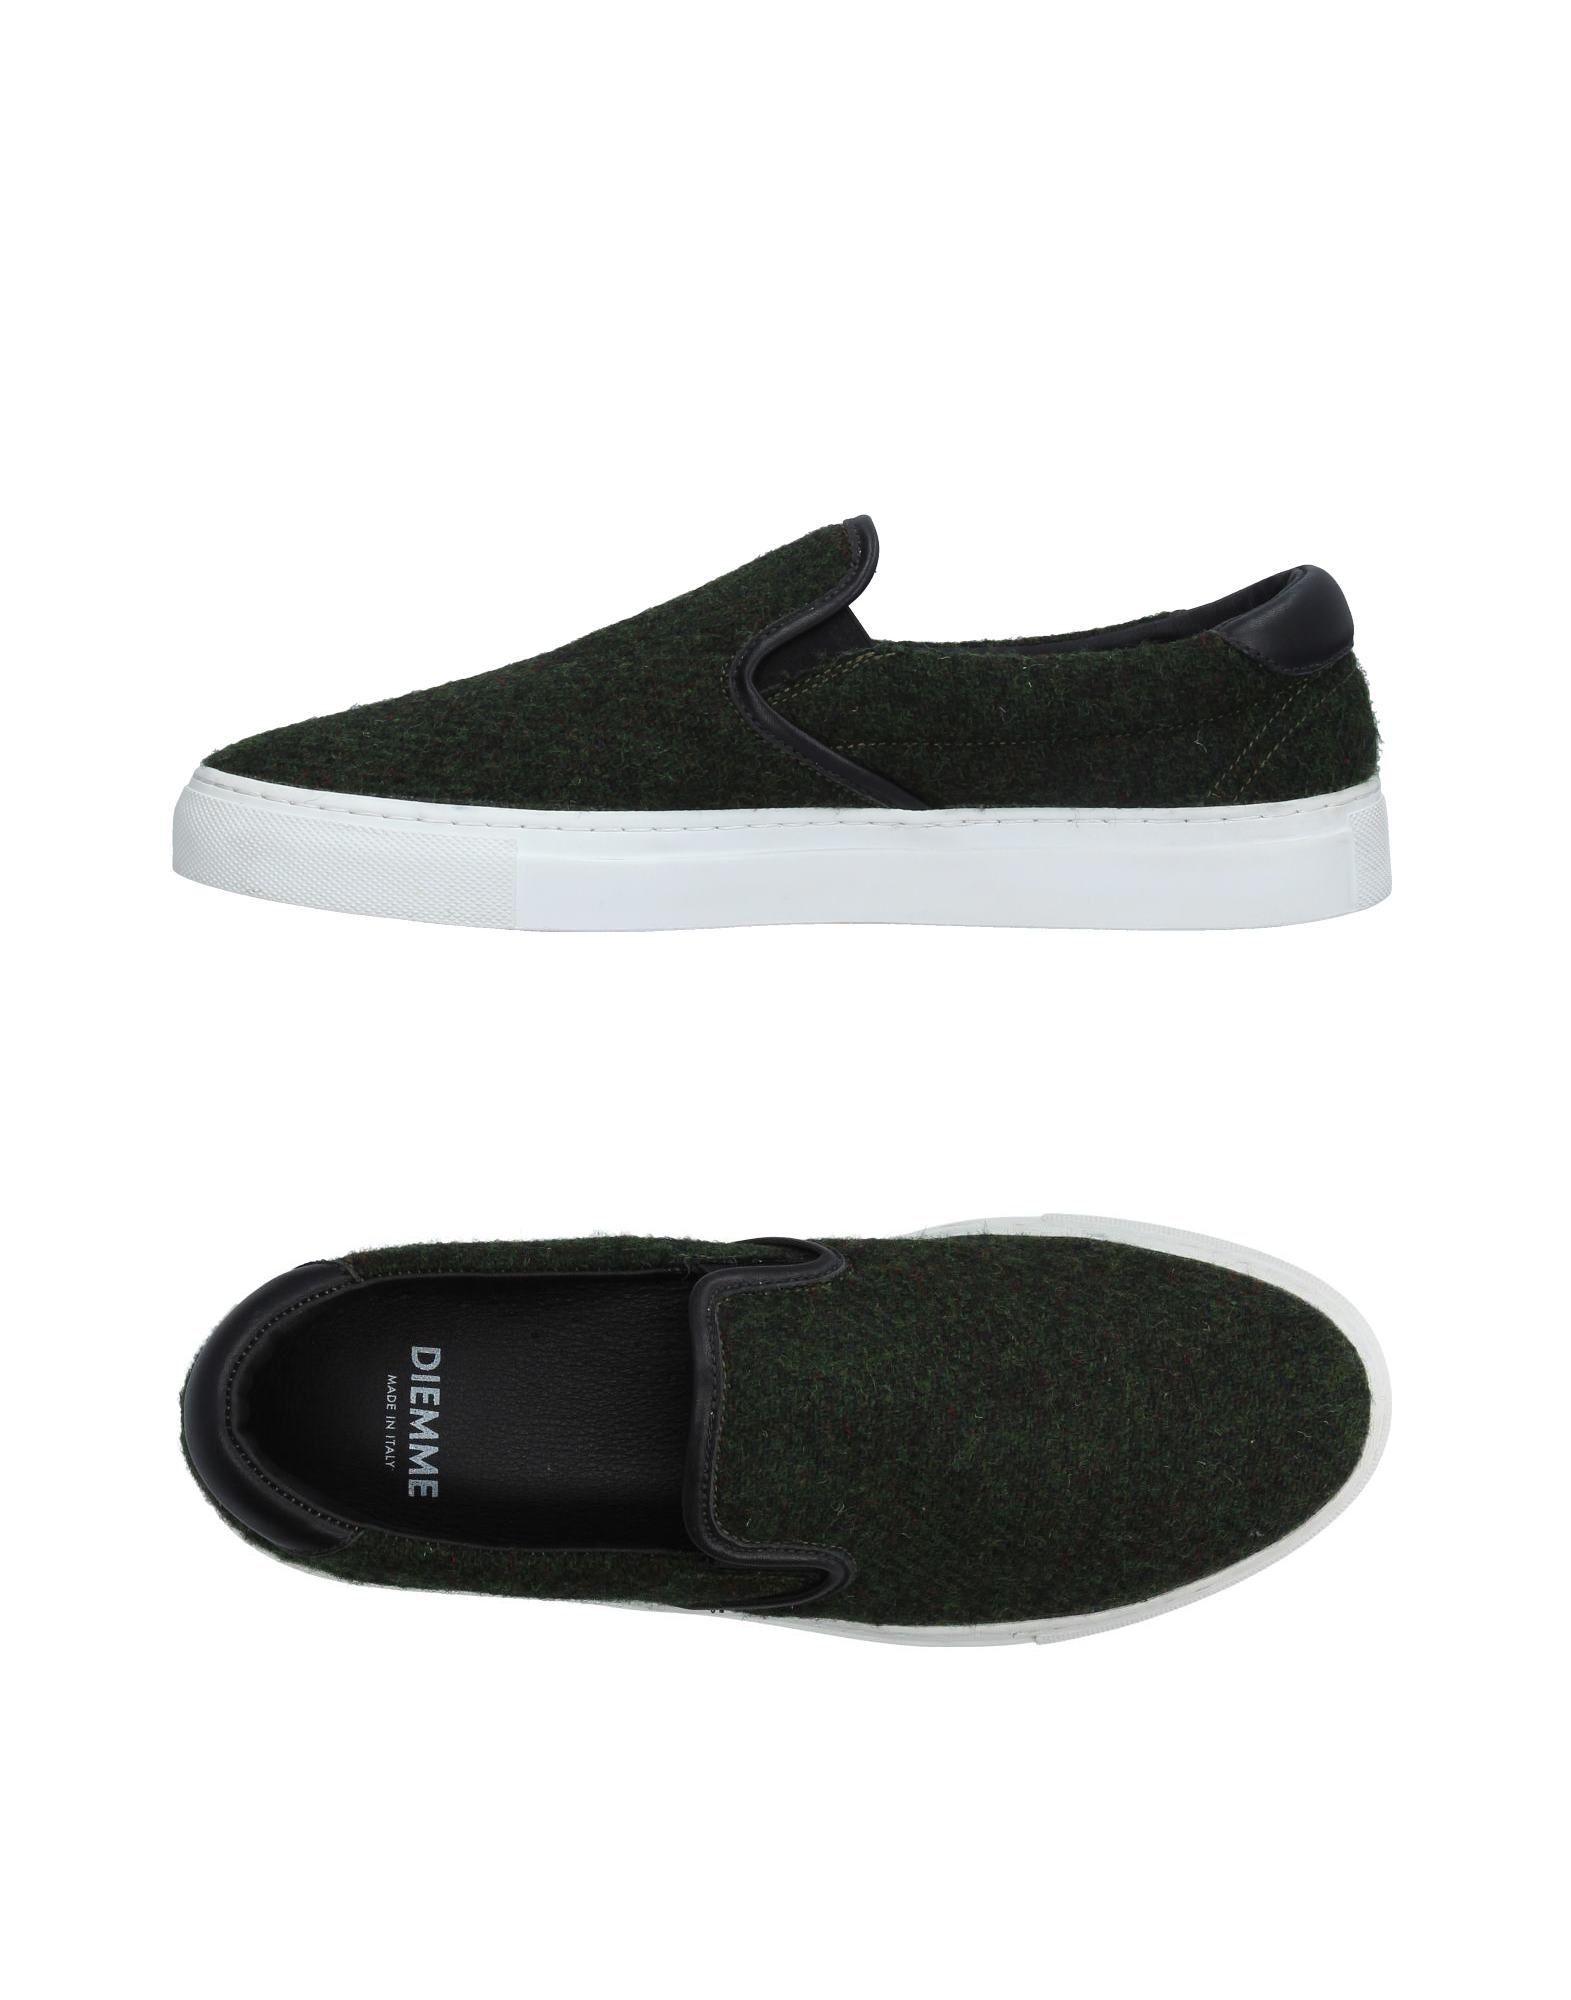 Diemme Sneakers Herren  11223825WD Gute Qualität beliebte Schuhe